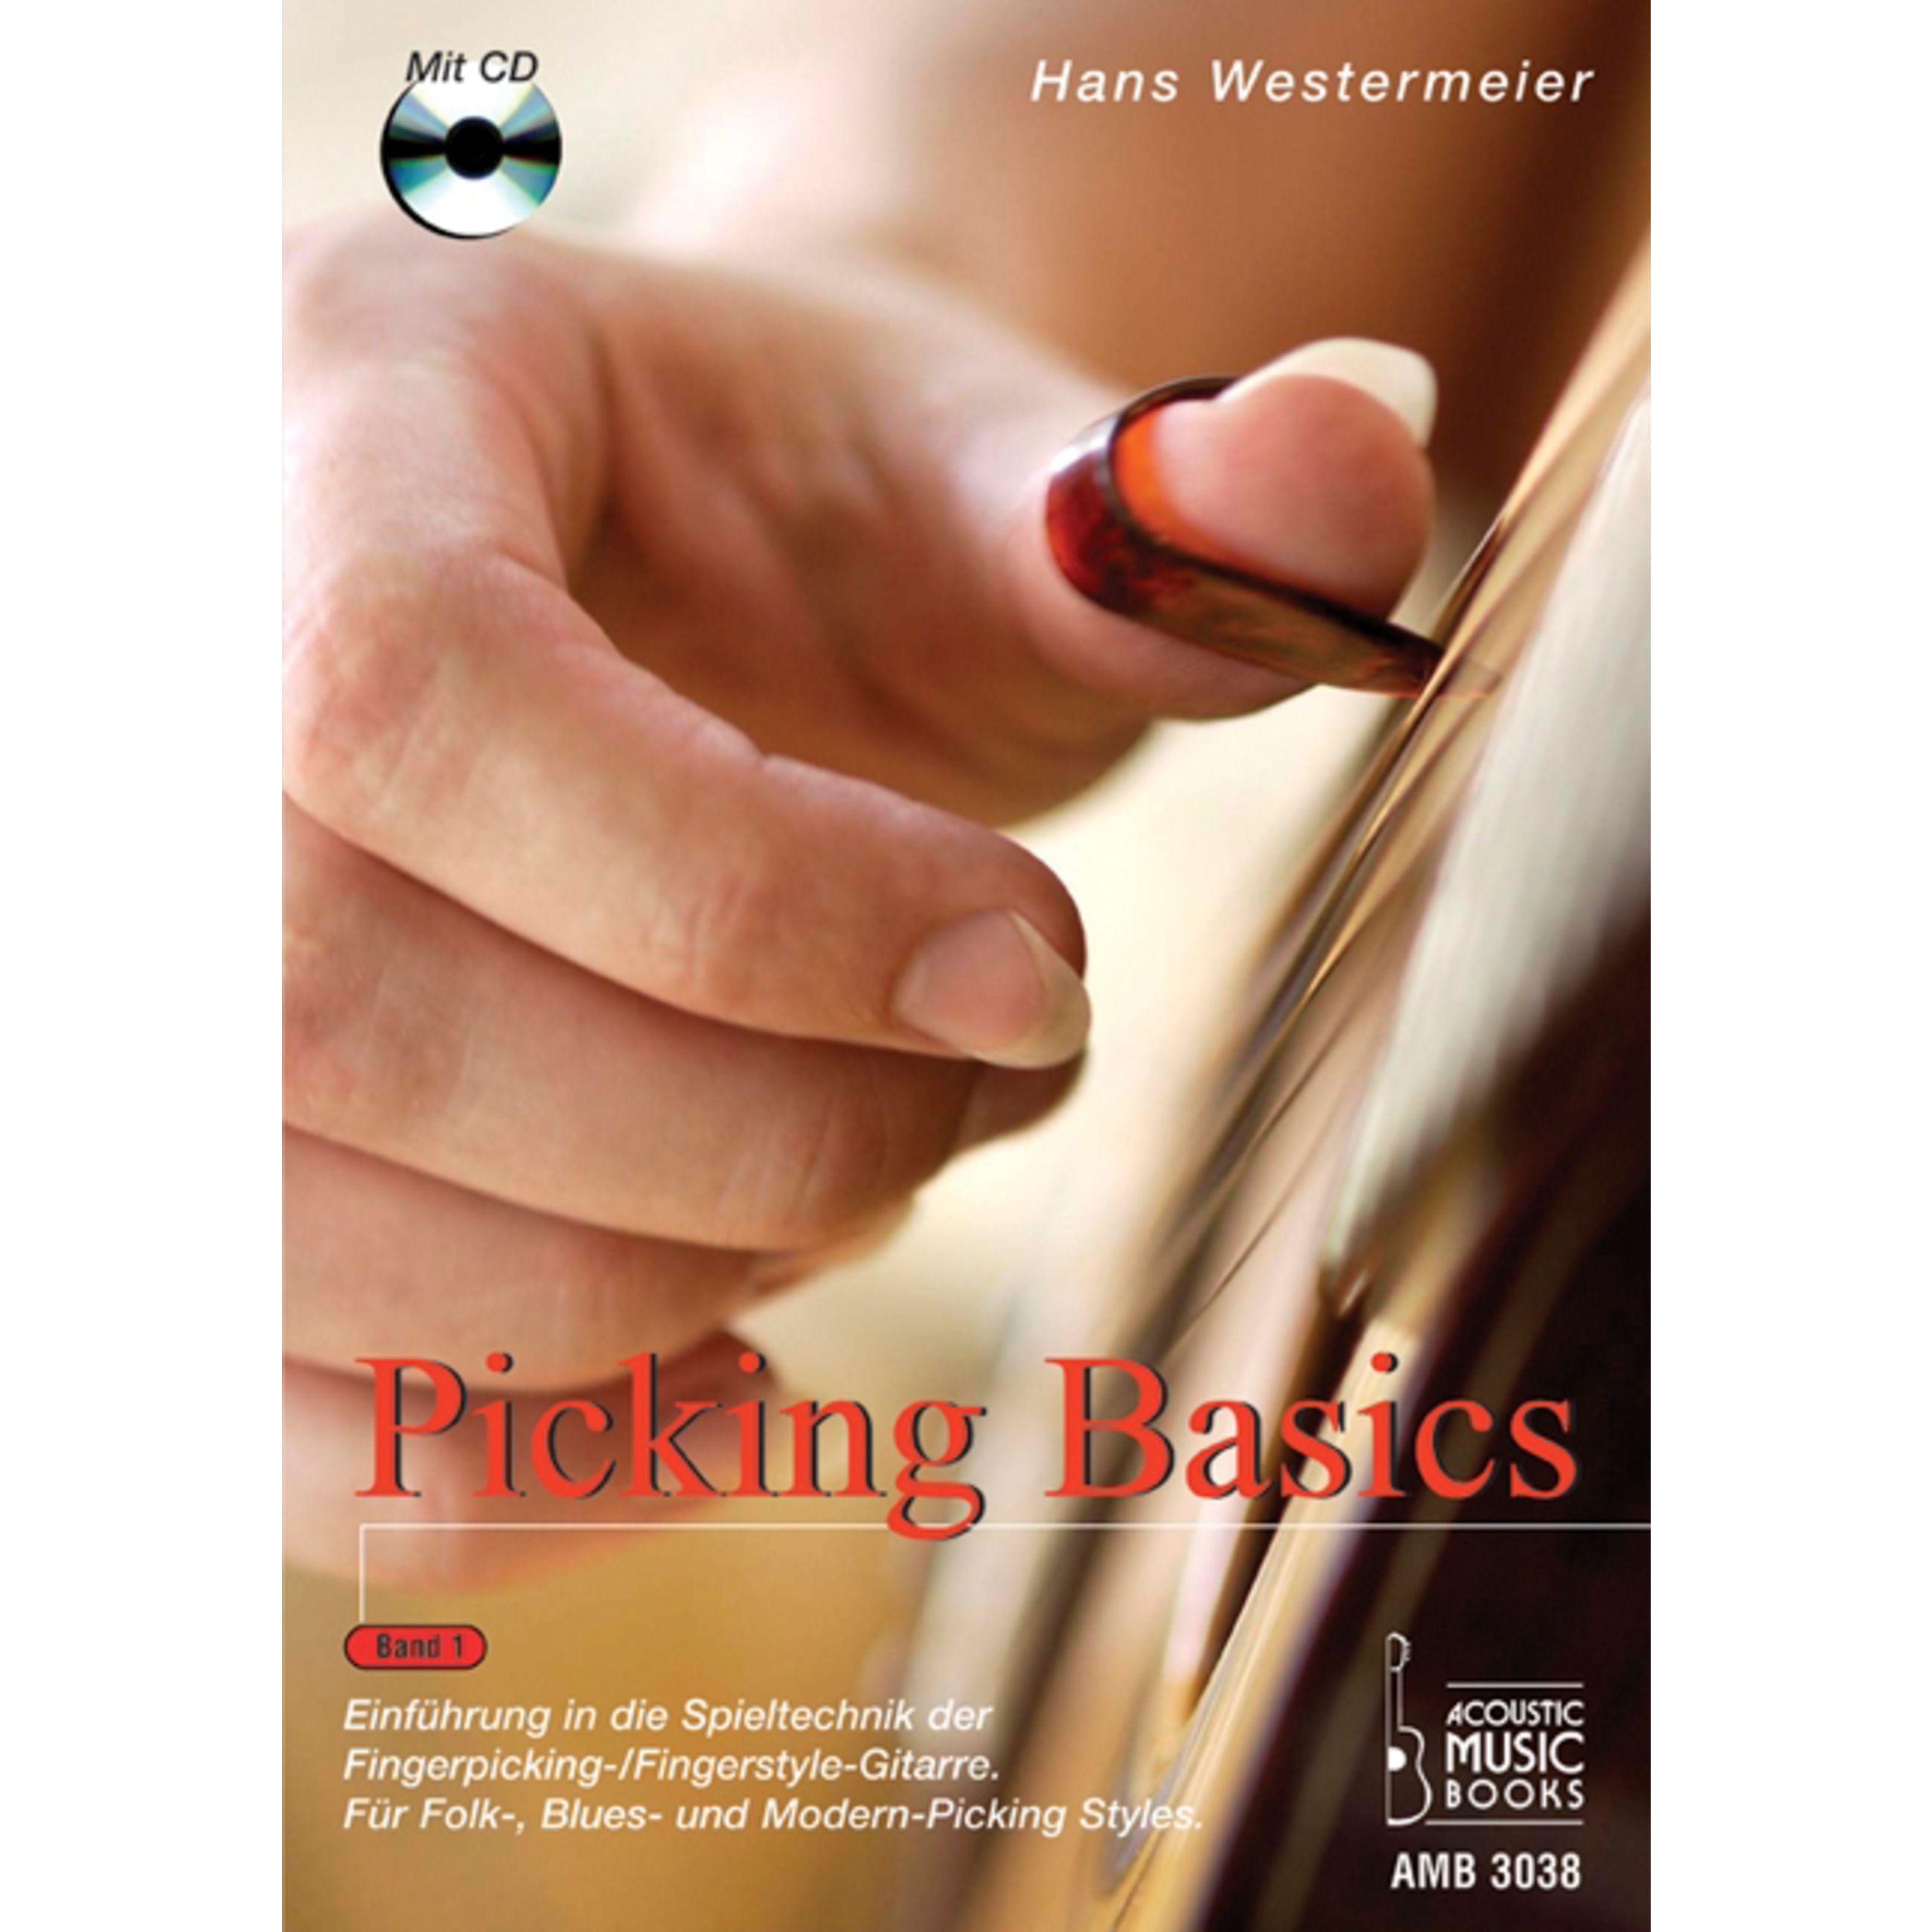 Acoustic Music Books - Picking Basics 1 für Gitarre Hans Westermeier, Buch/CD AMB 3038